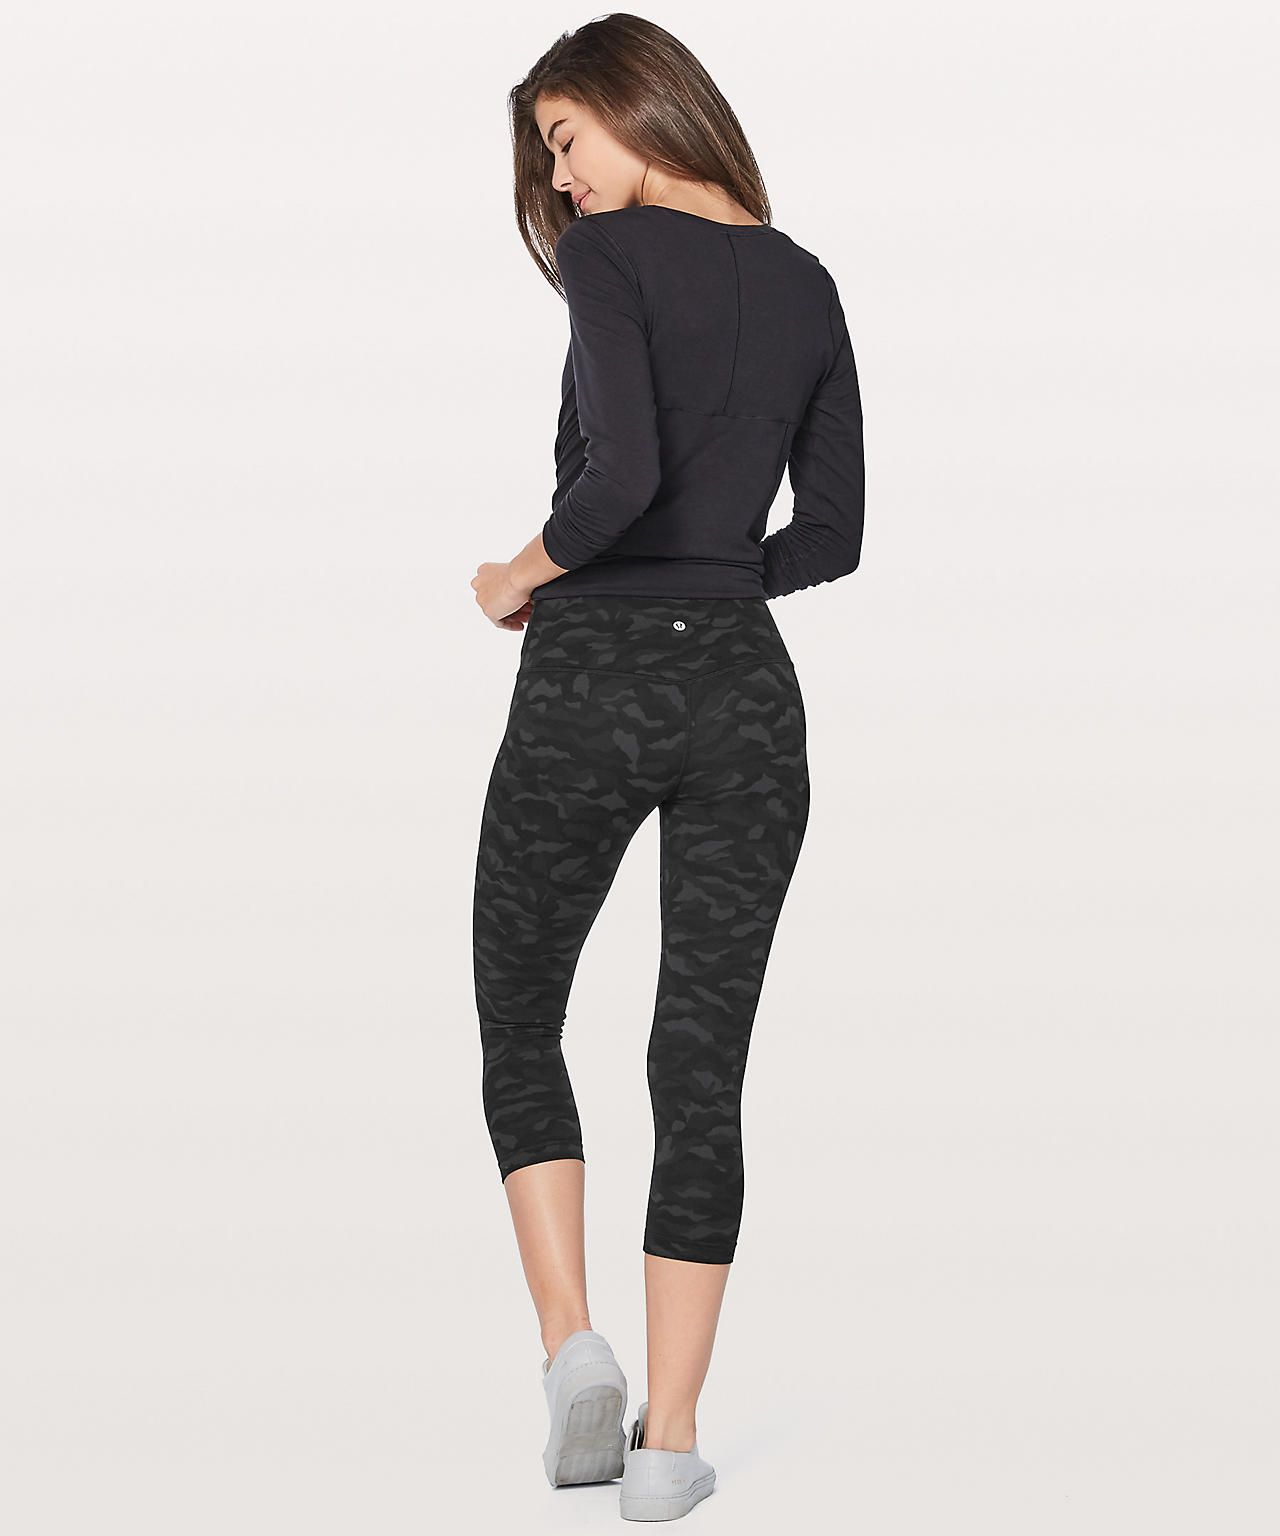 Lululemon Align Crop In Sequoia Camo Deep Coal And Black Fashion Pants Capri Pants